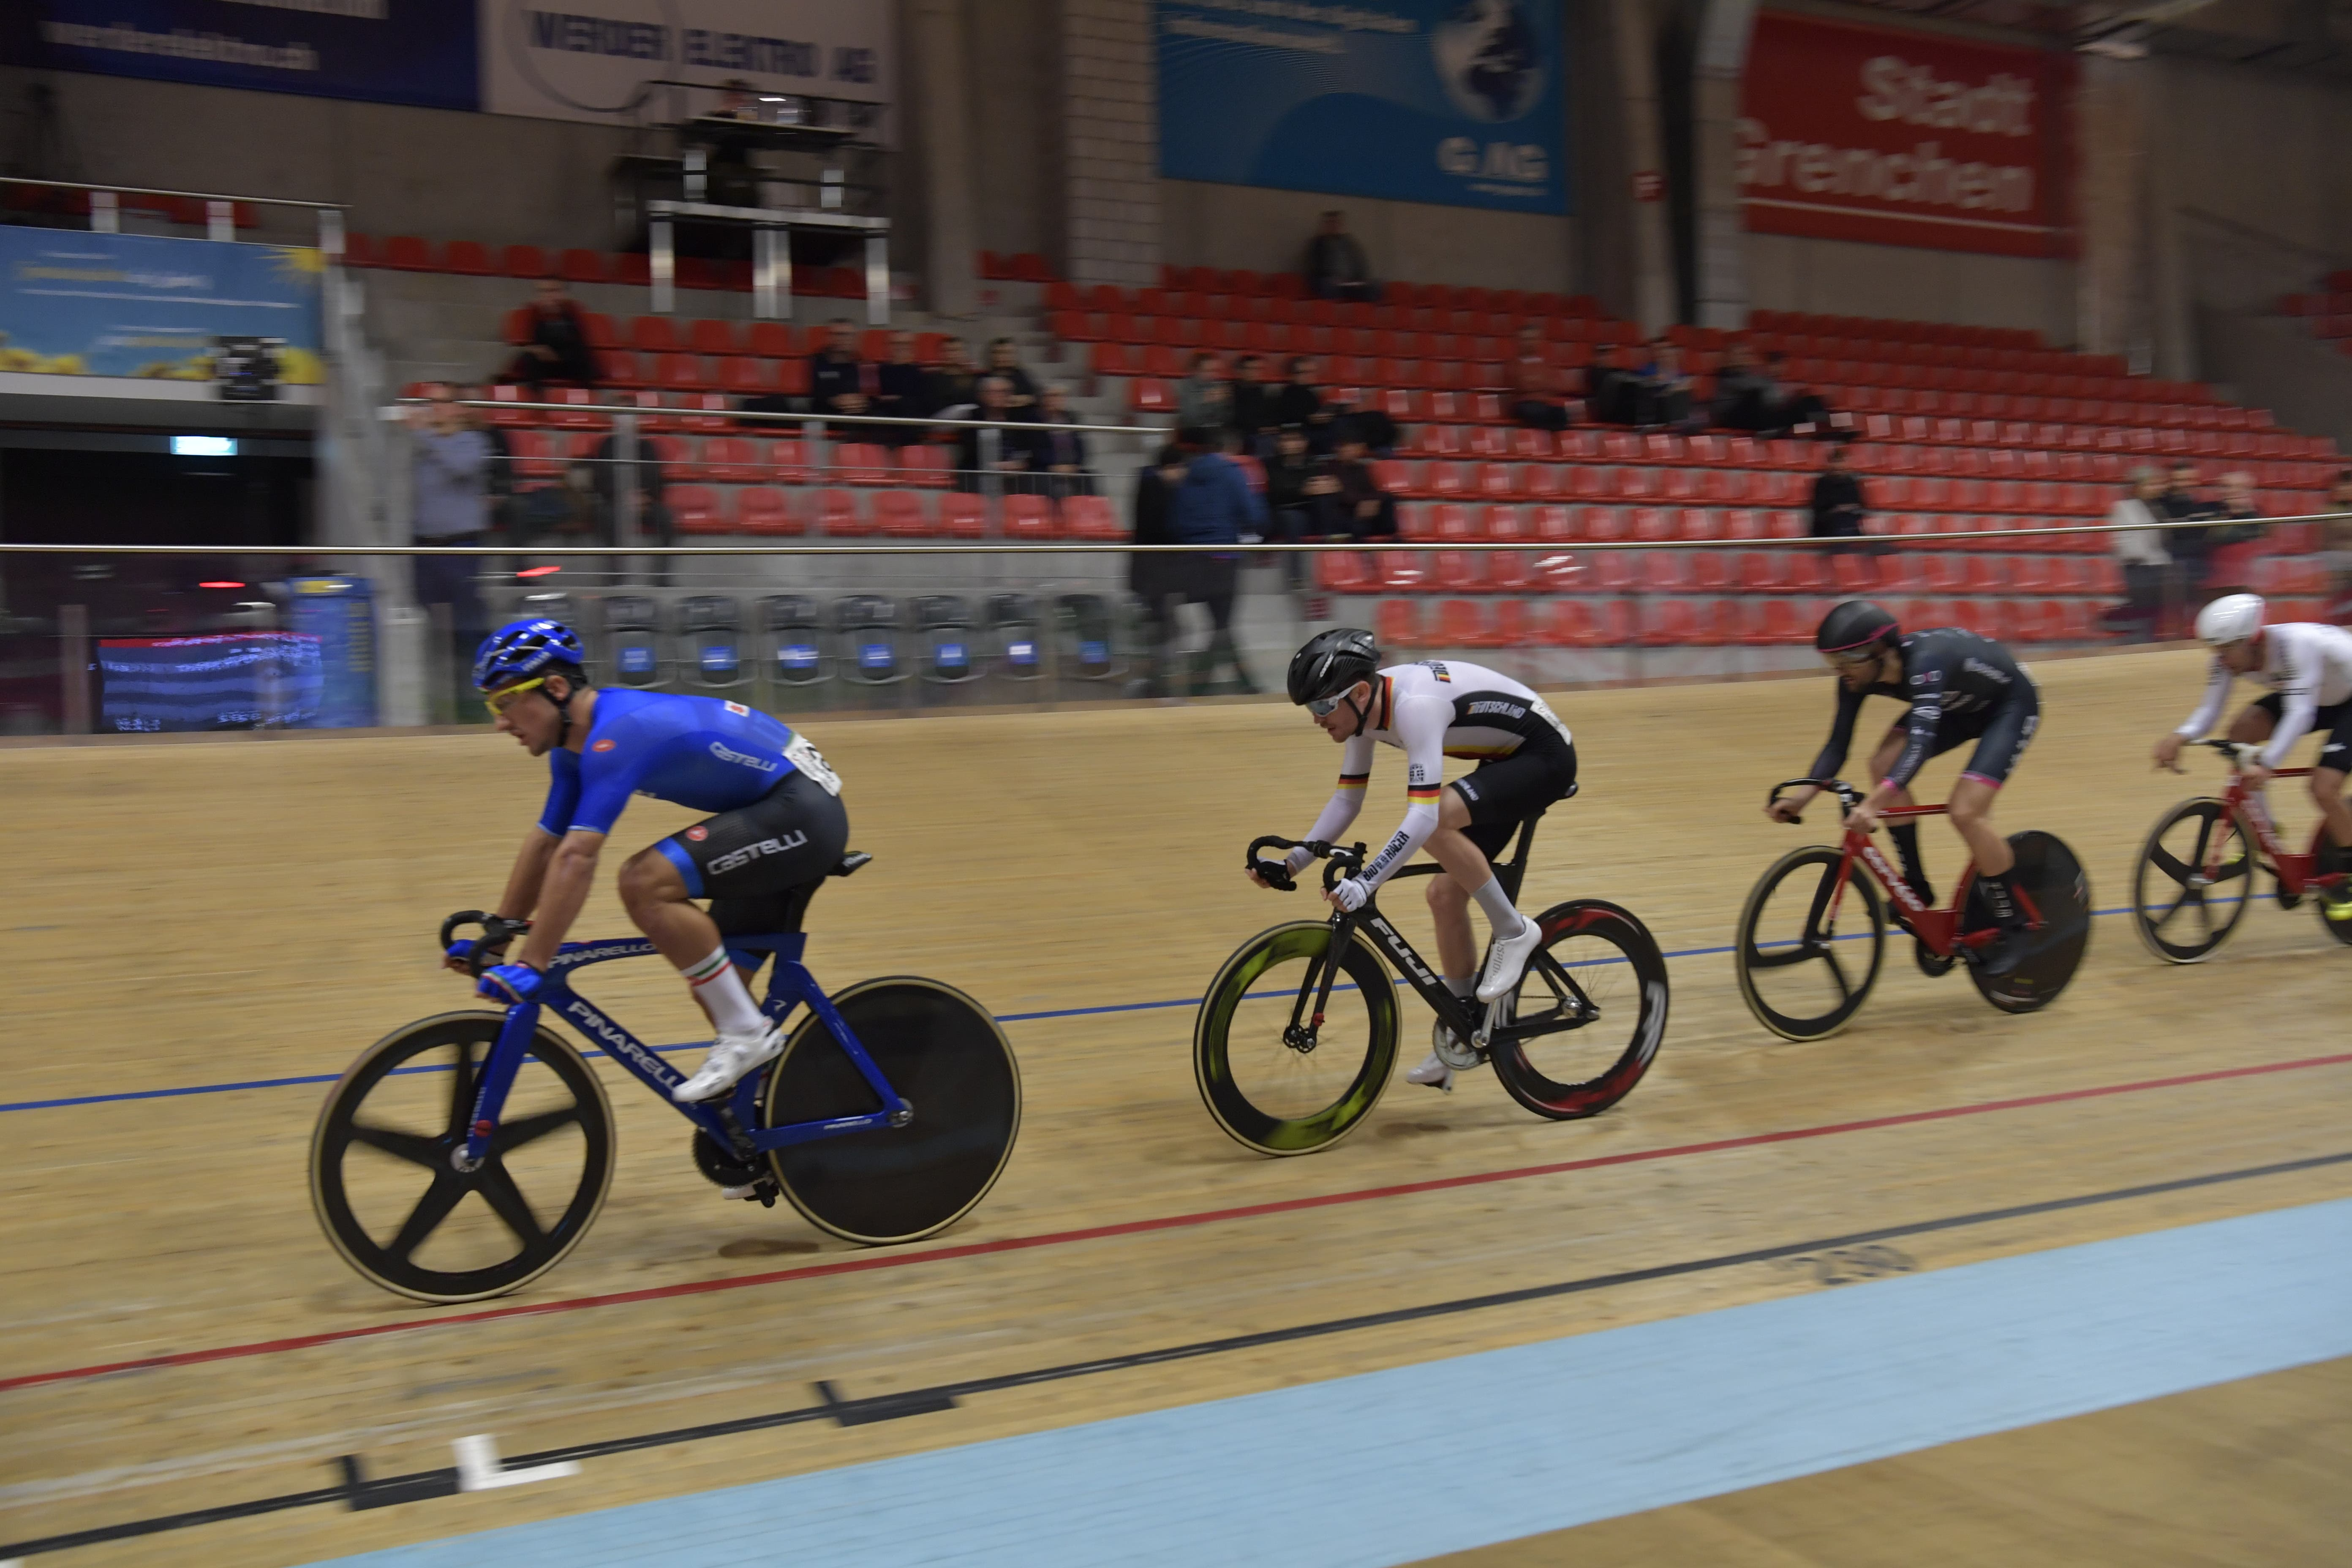 Impressionen der Track Cycling Challenge im Velodrome Omnium CL 1 2. Tempo Race über 10 Kilometer Herren Elite